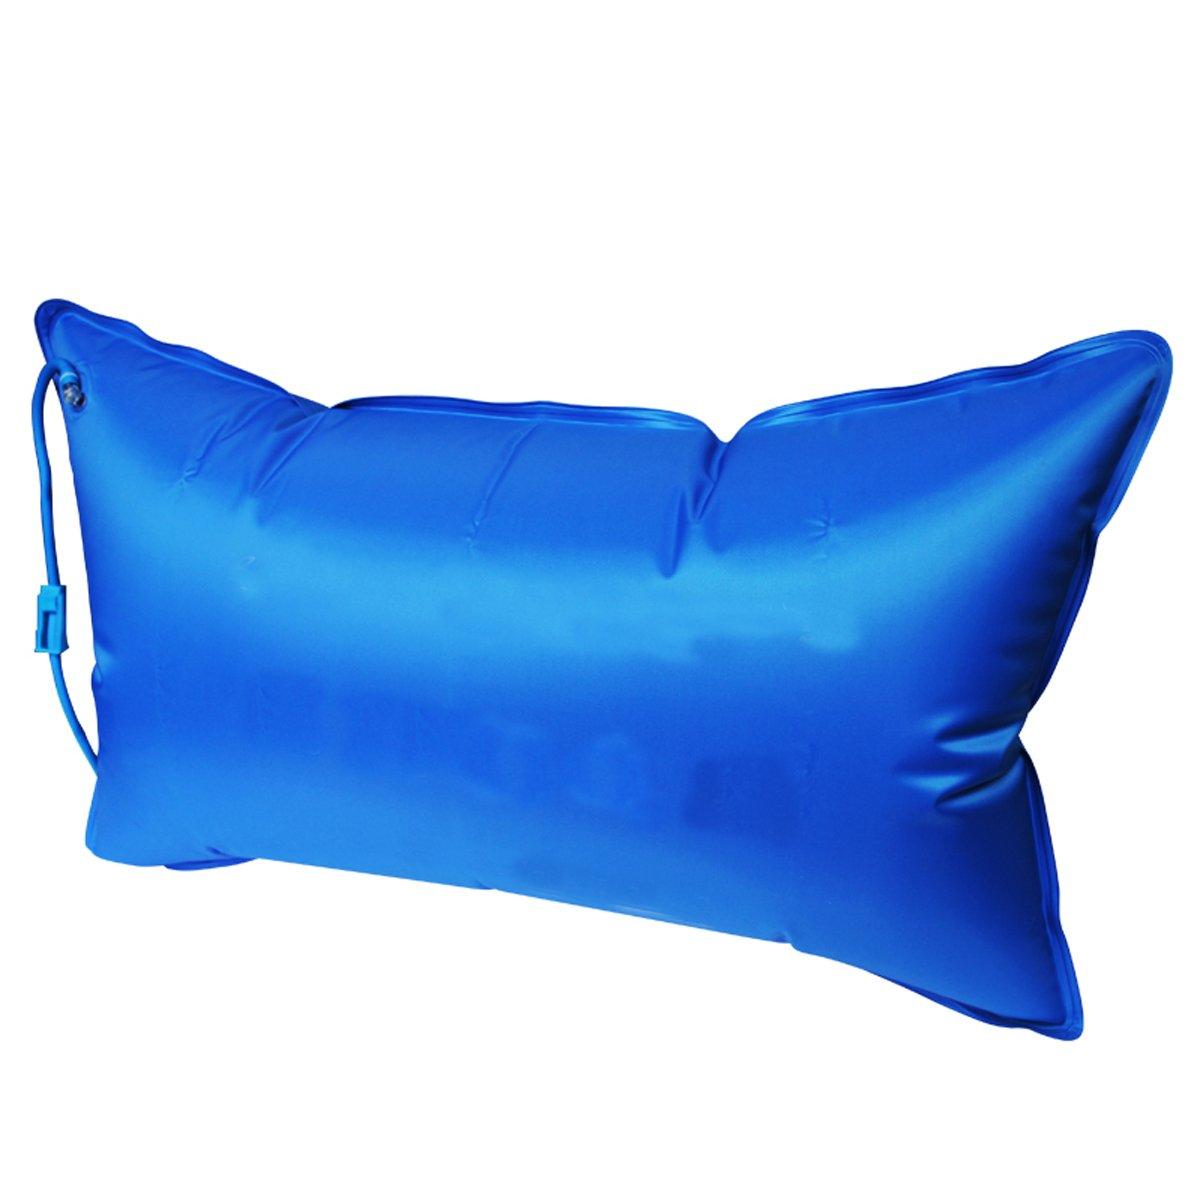 Portable Emergency Family Expenses Oxygen Bag Travel Oxygen Carry Bag 42L(Bag Empty)